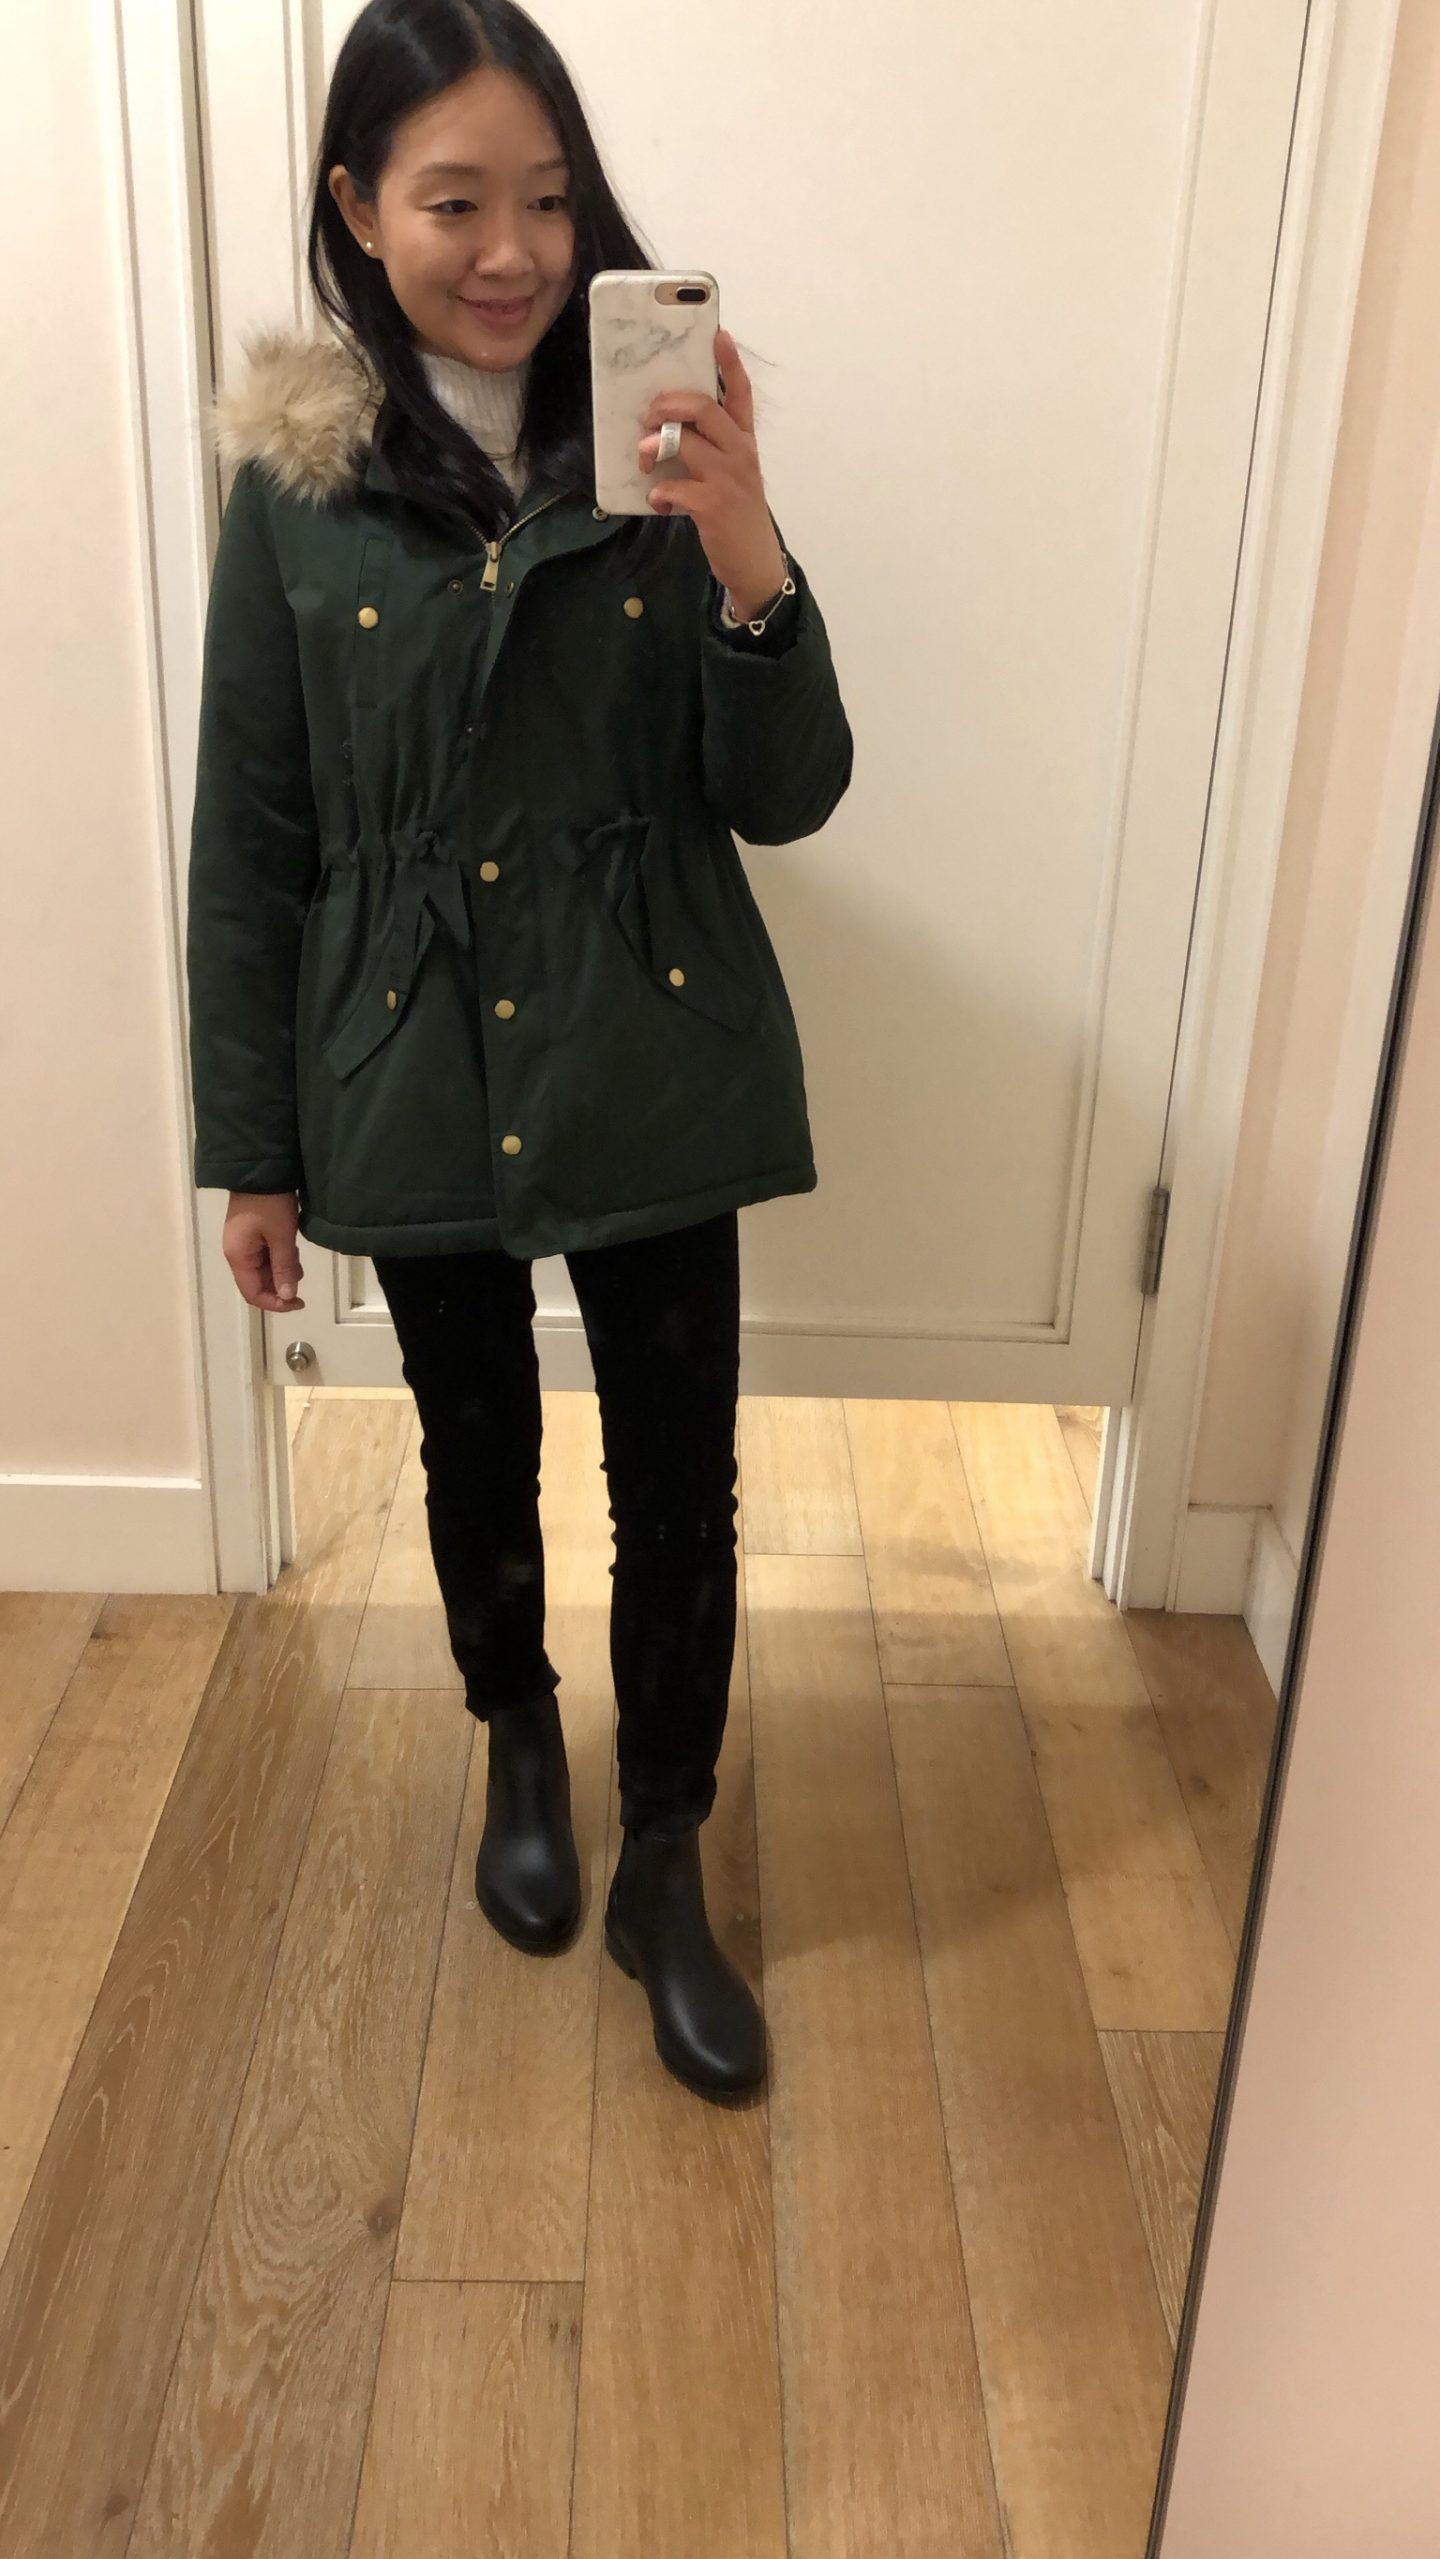 LOFT Faux Fur Lined Hooded Parka, size XSP